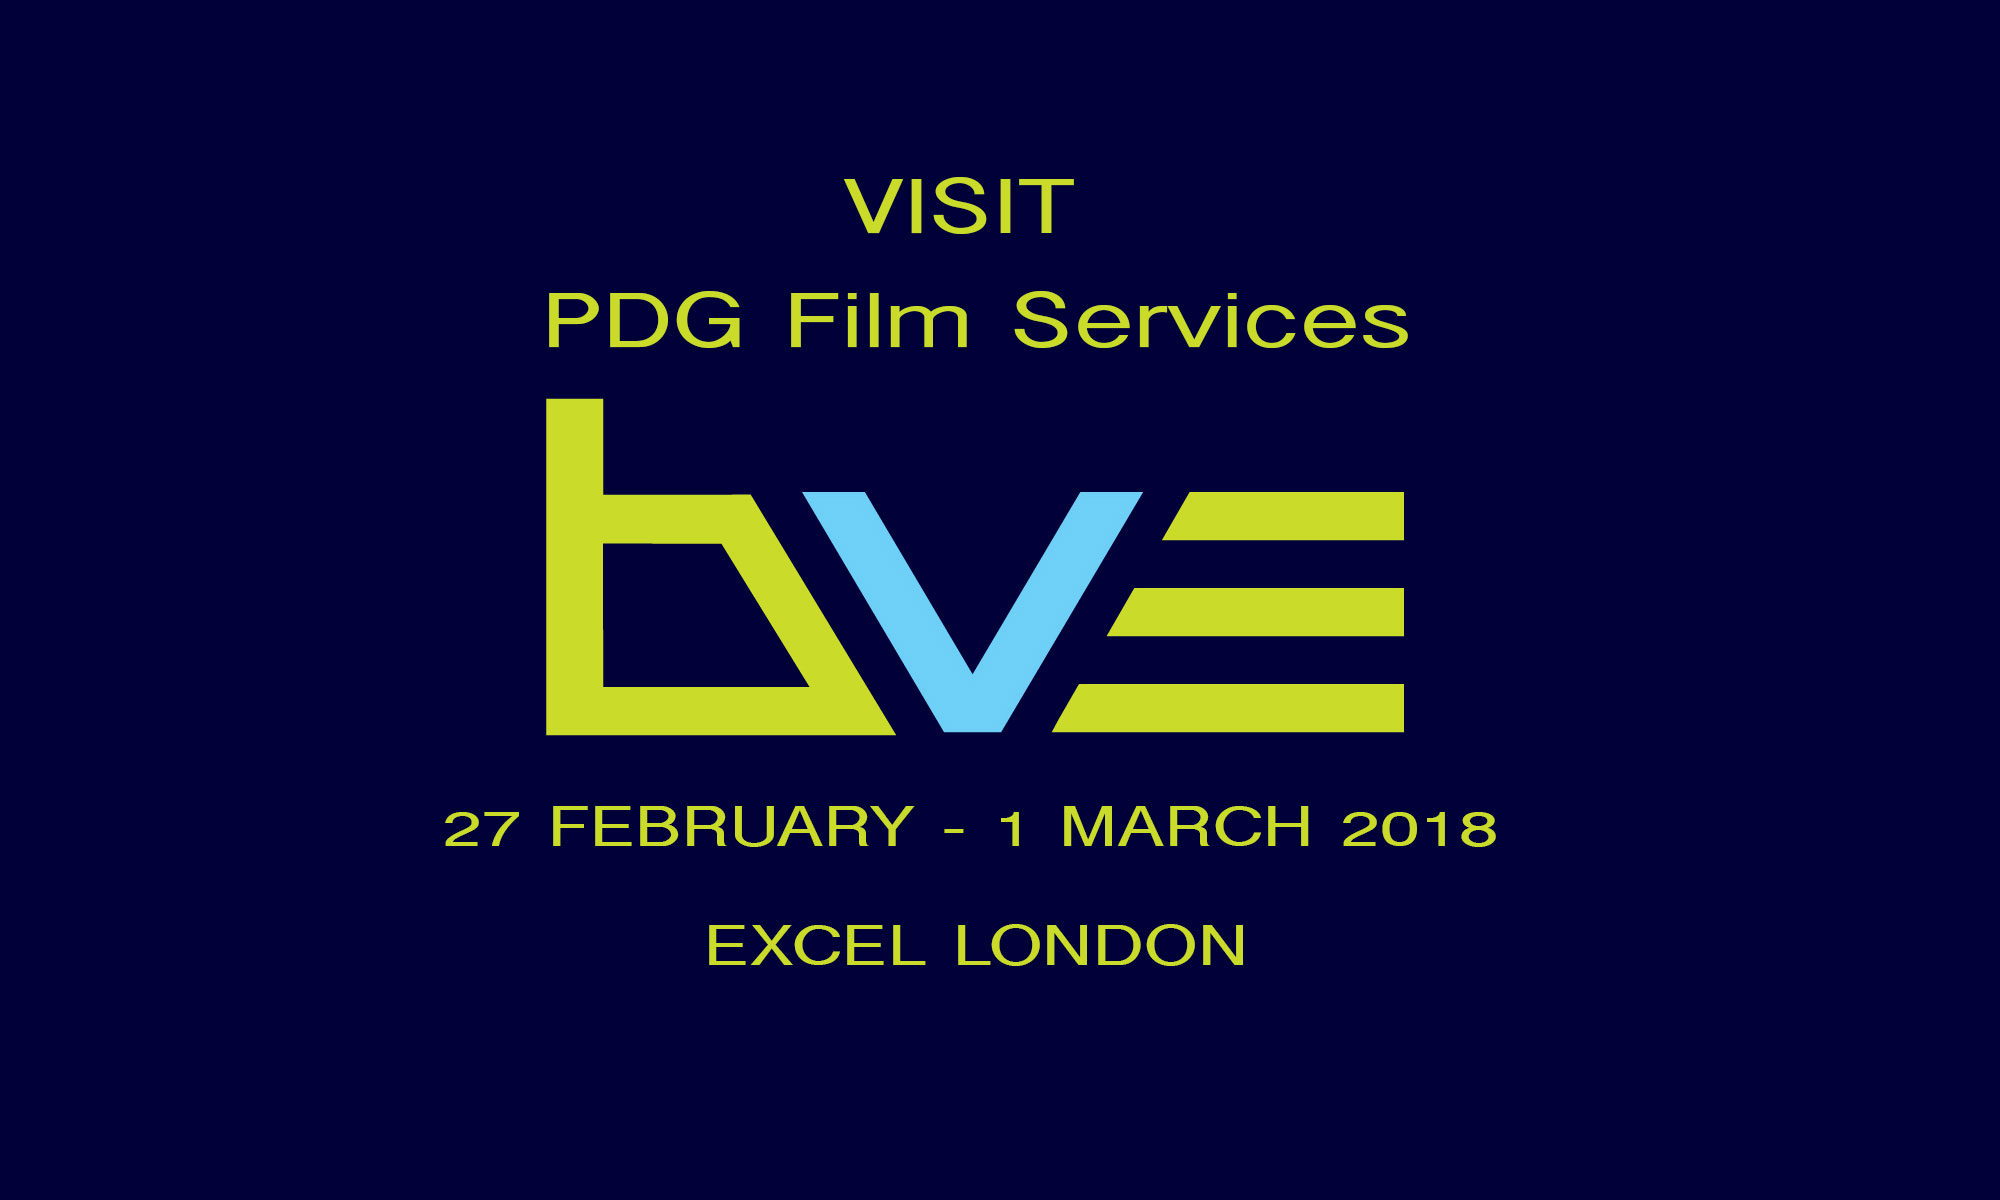 Visit PDG Film services at BVE 2018